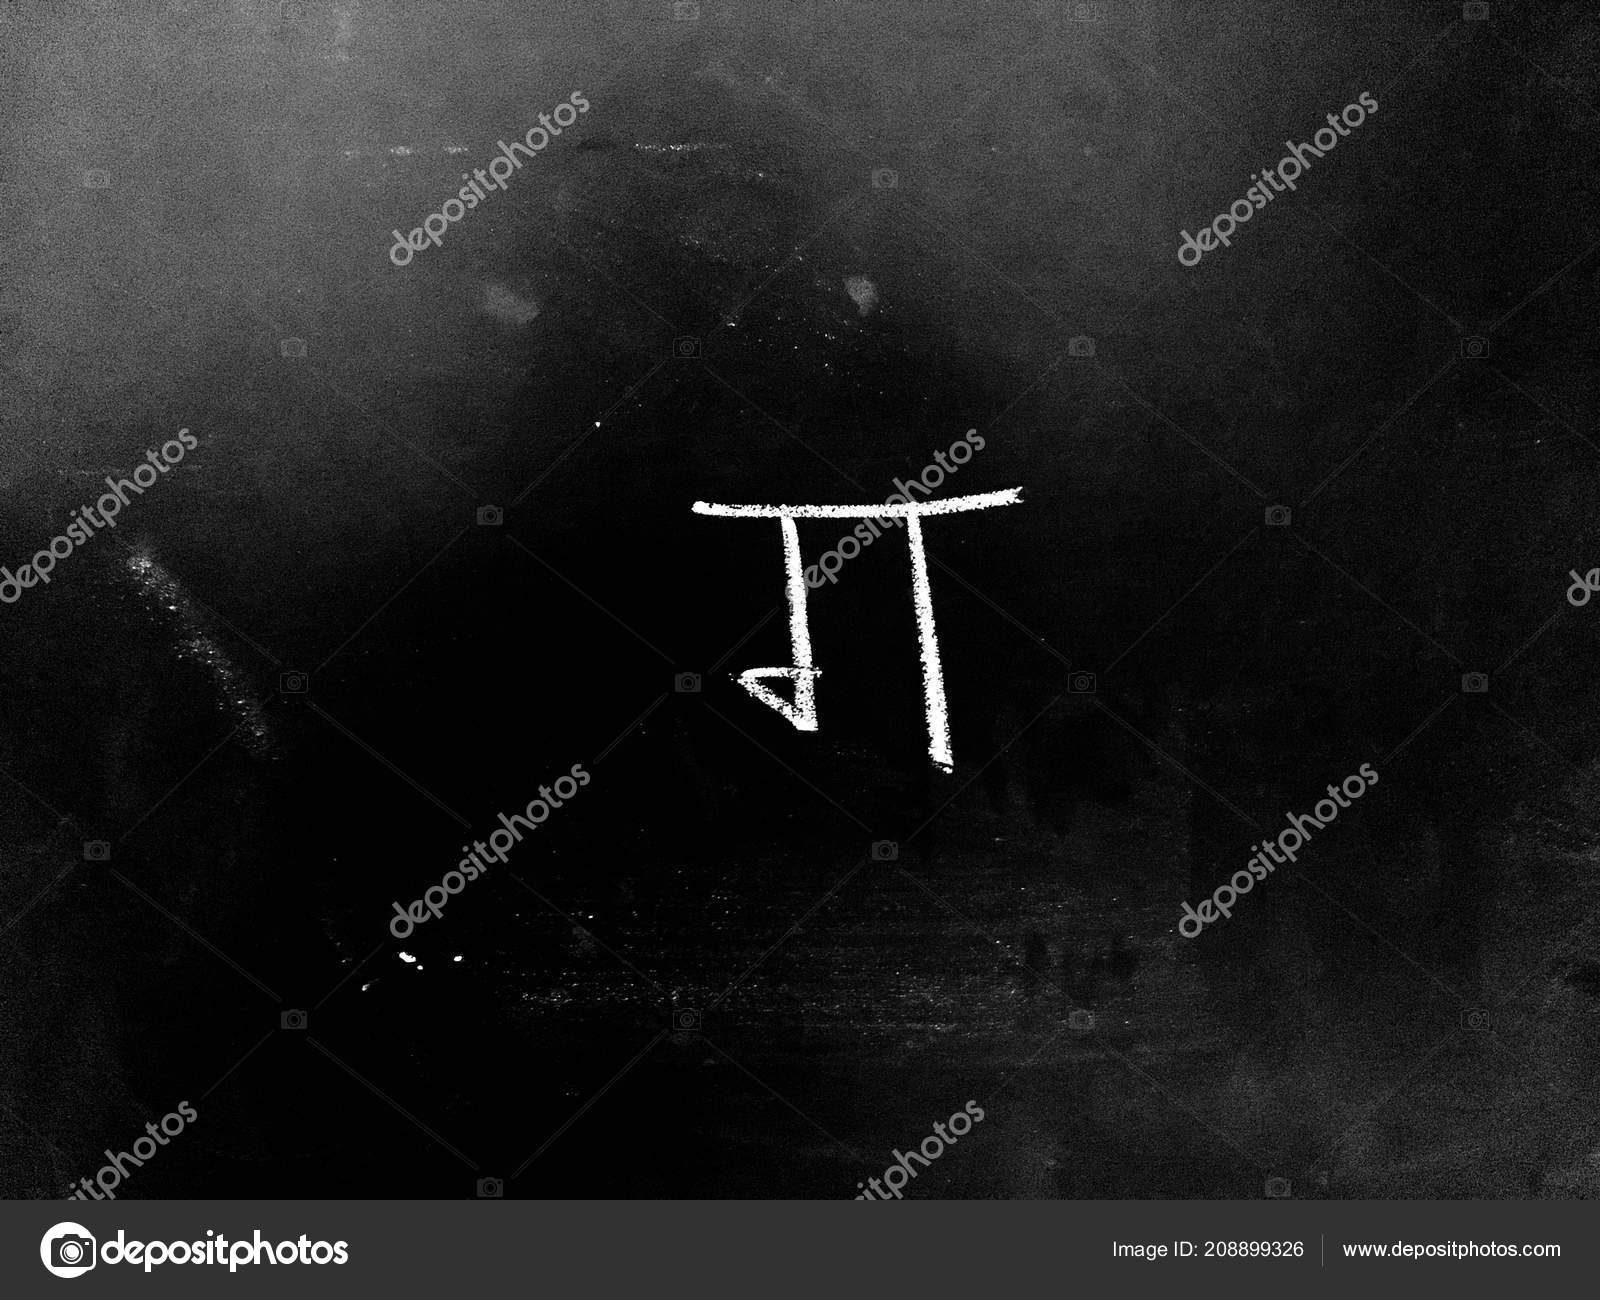 Hindi Script Handwritten Blackboard Translation Written Hindi Script